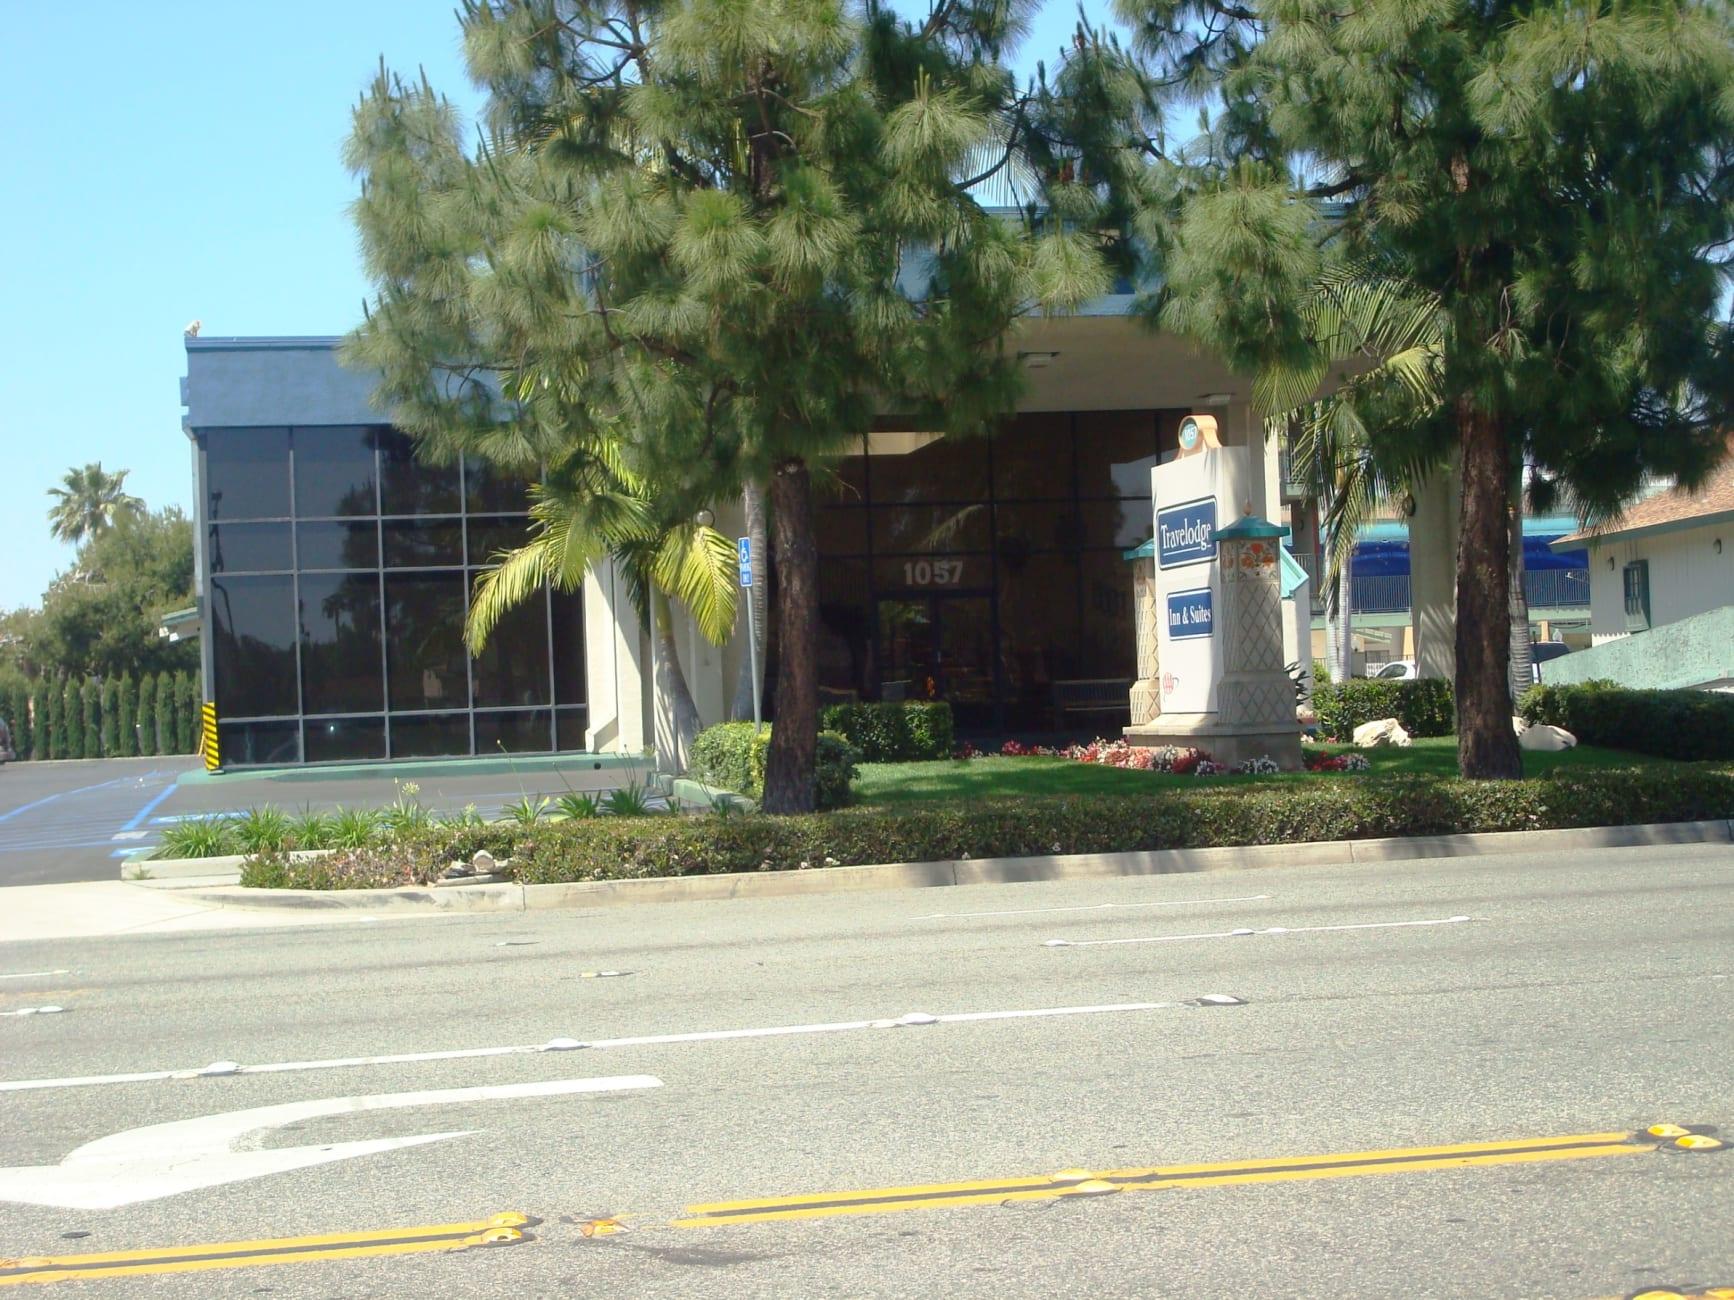 anaheim hotels with kitchen near disneyland butcher block island travelodge inn and suite on drive california